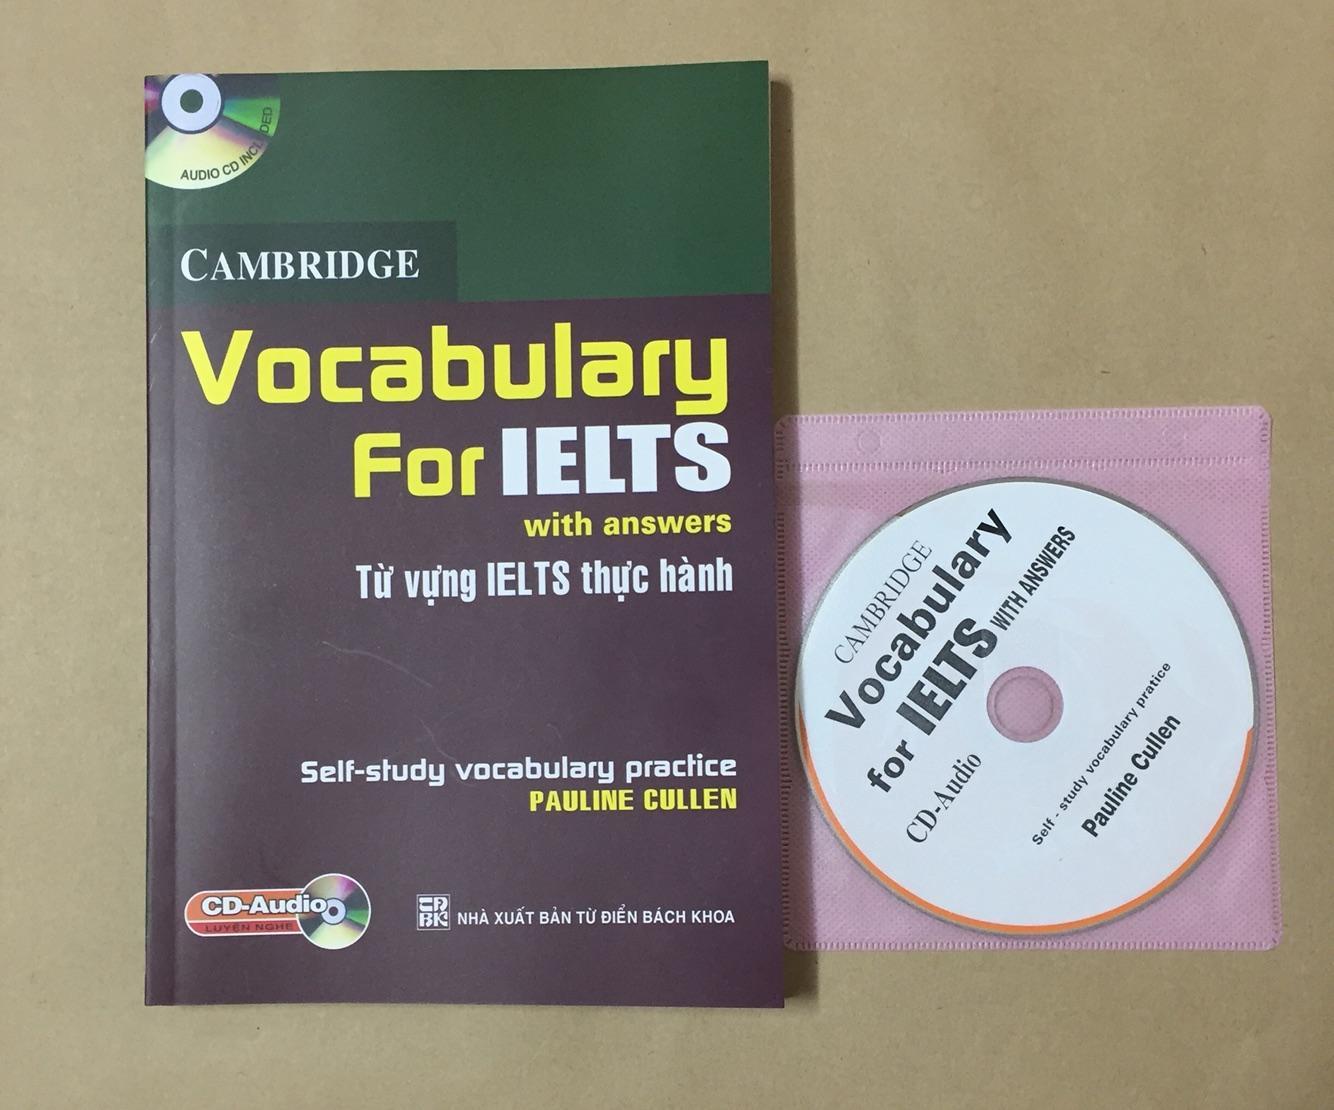 Cam bridge Vocabulary For IELTS kèm CD